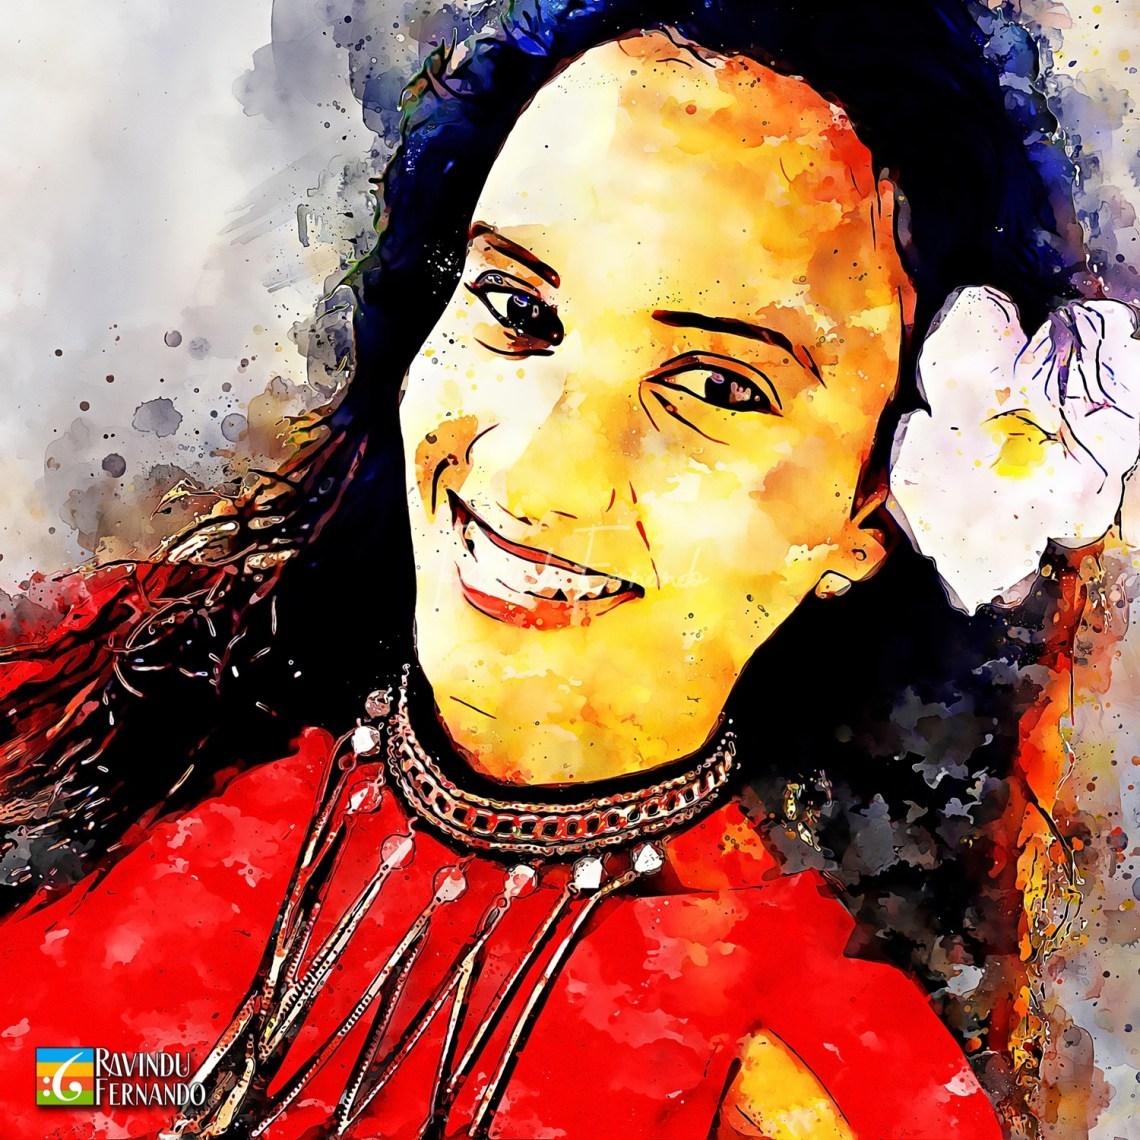 Dasuni Jayasinghe - Digital Watercolor Painting